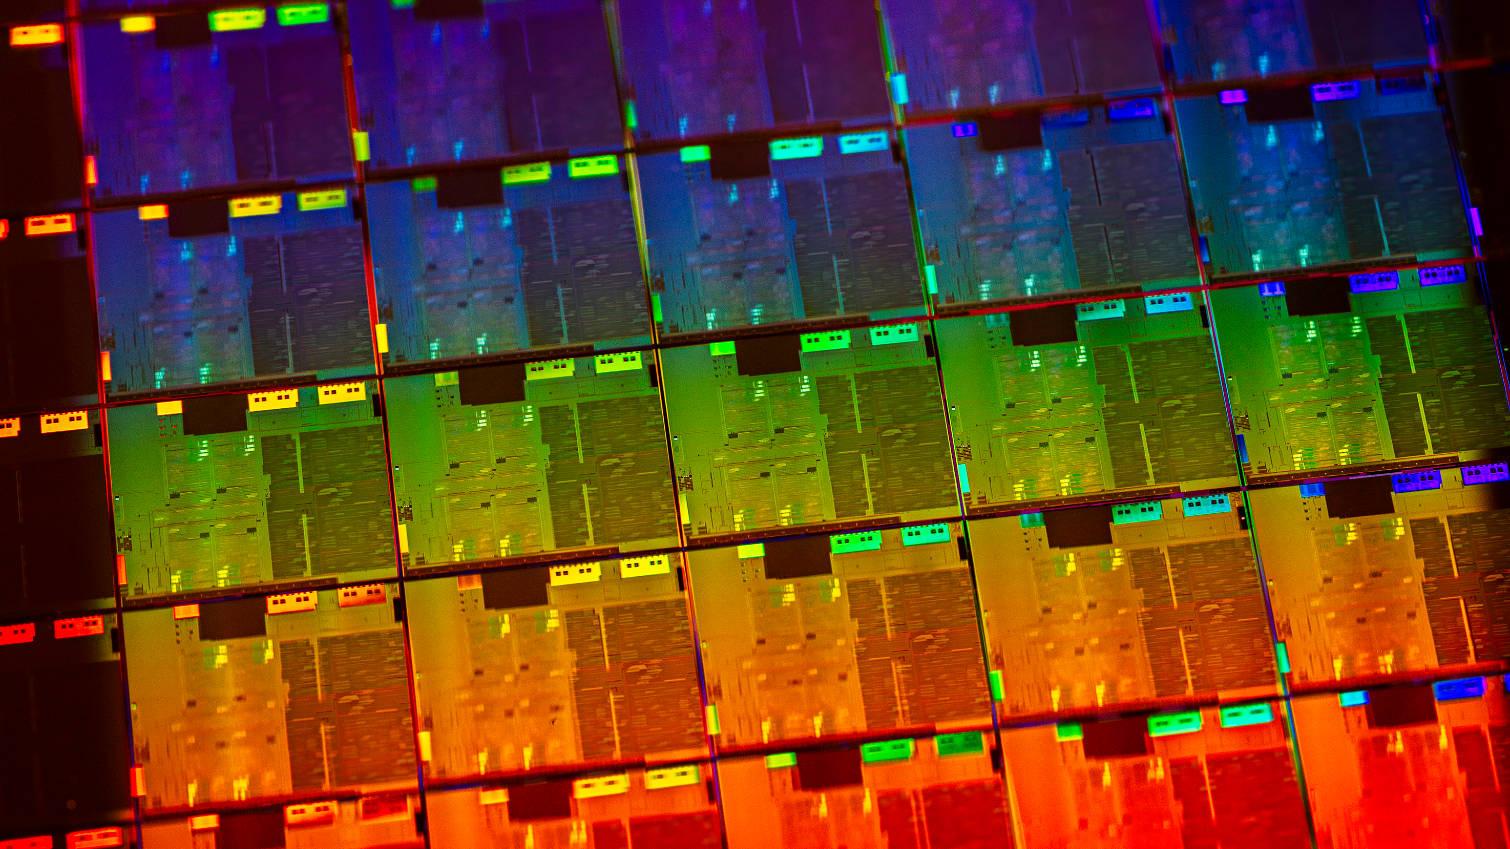 Intel Comet Lake mobile chip